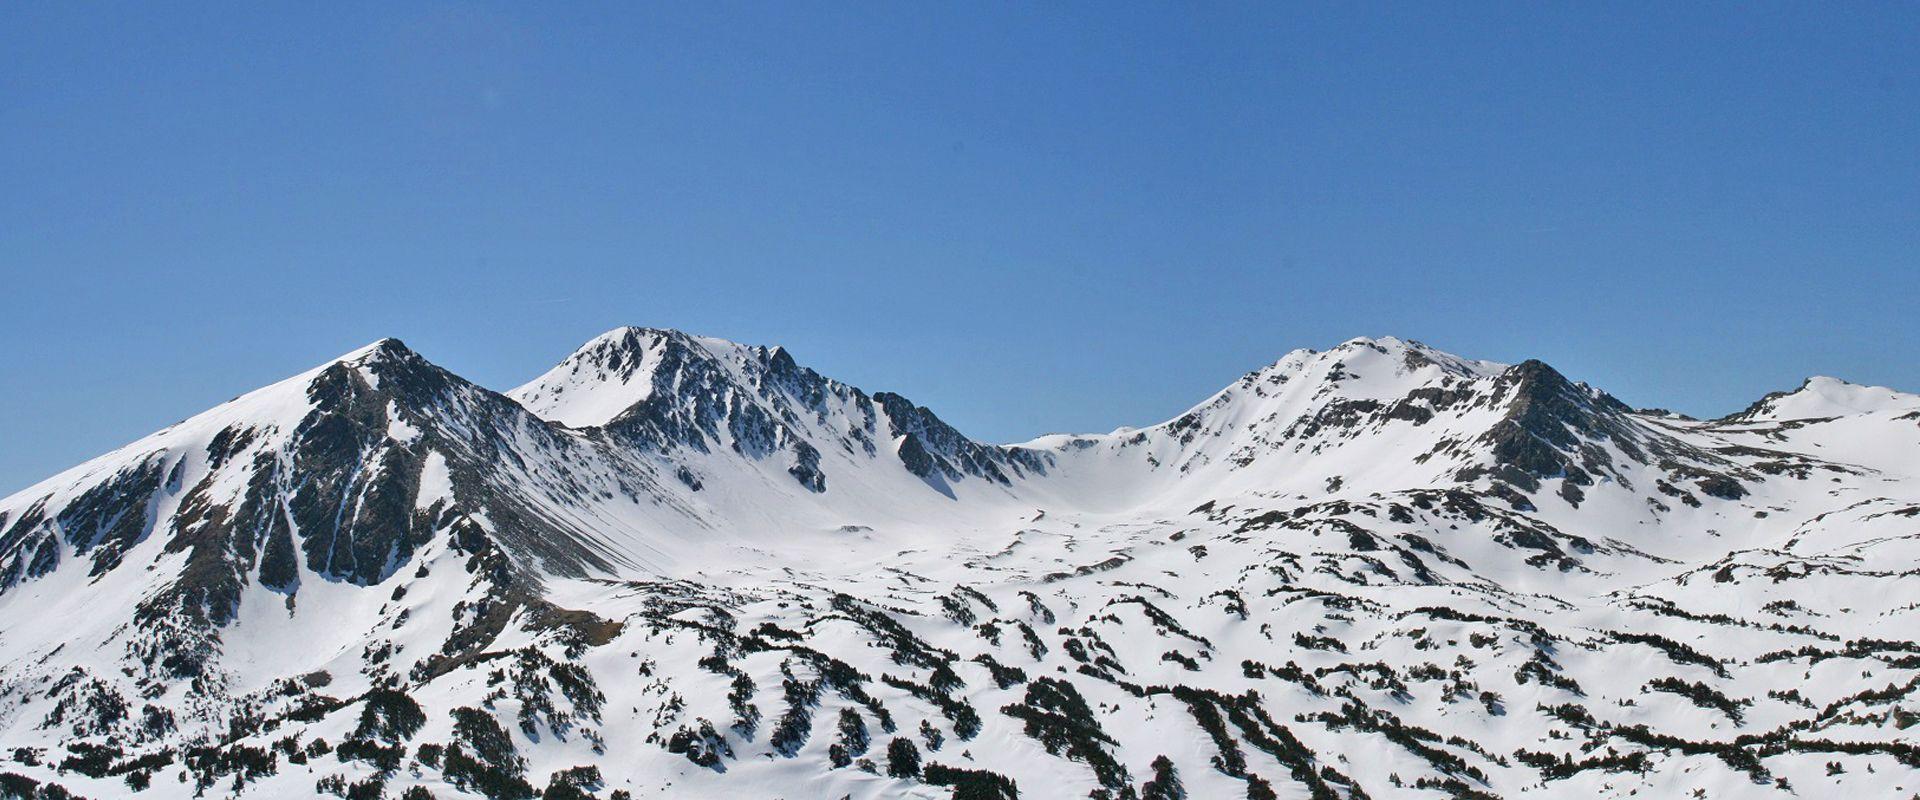 Ski de randonnée depuis la station de ski de Formiguères - Les Camporells